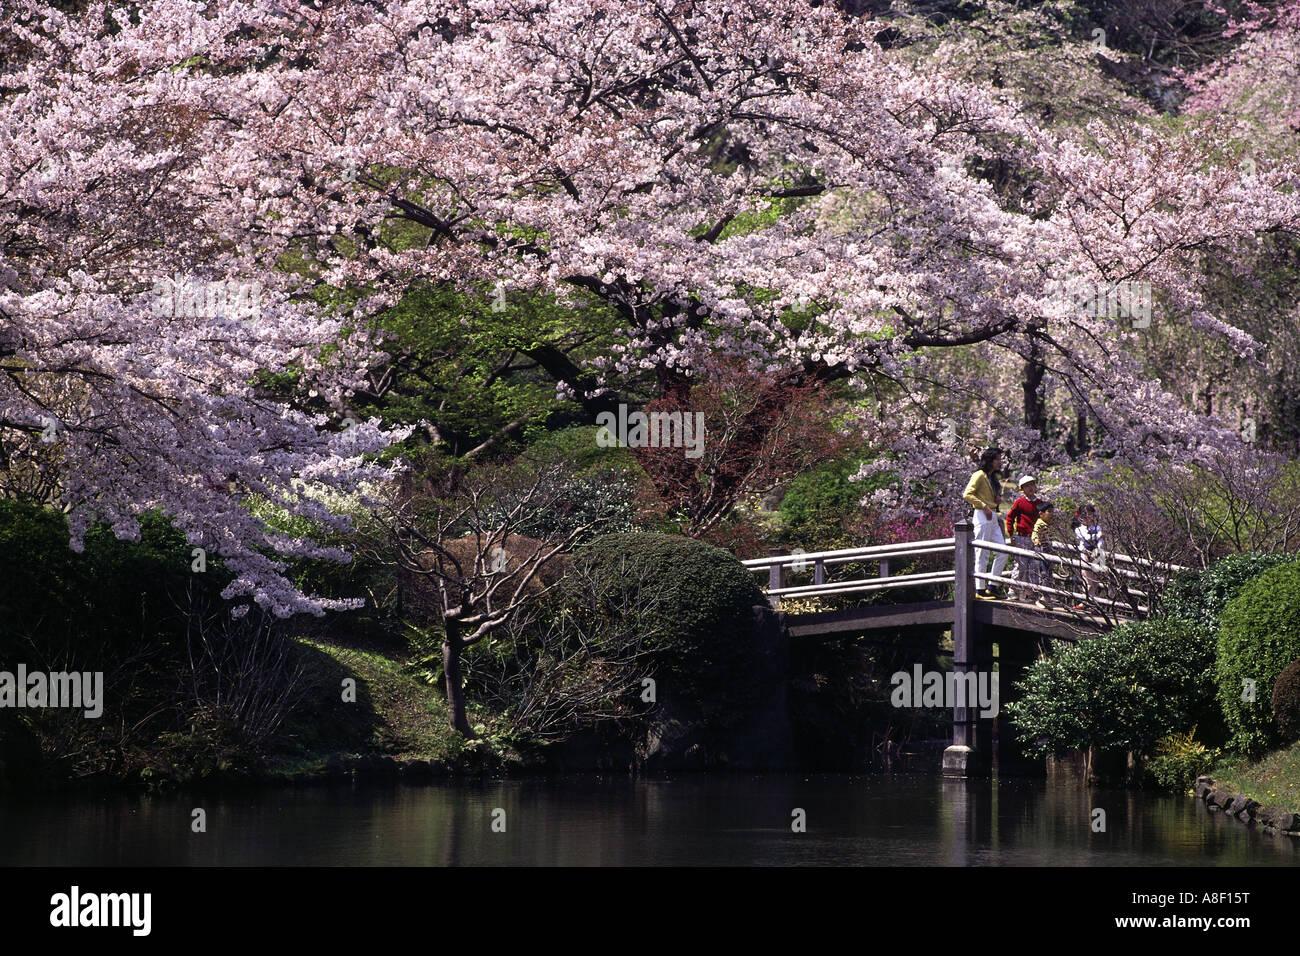 stock photo geography travel japan tokyo garden parks korakuen park cherry blossom tourists bridge cherry tree blooming koraku